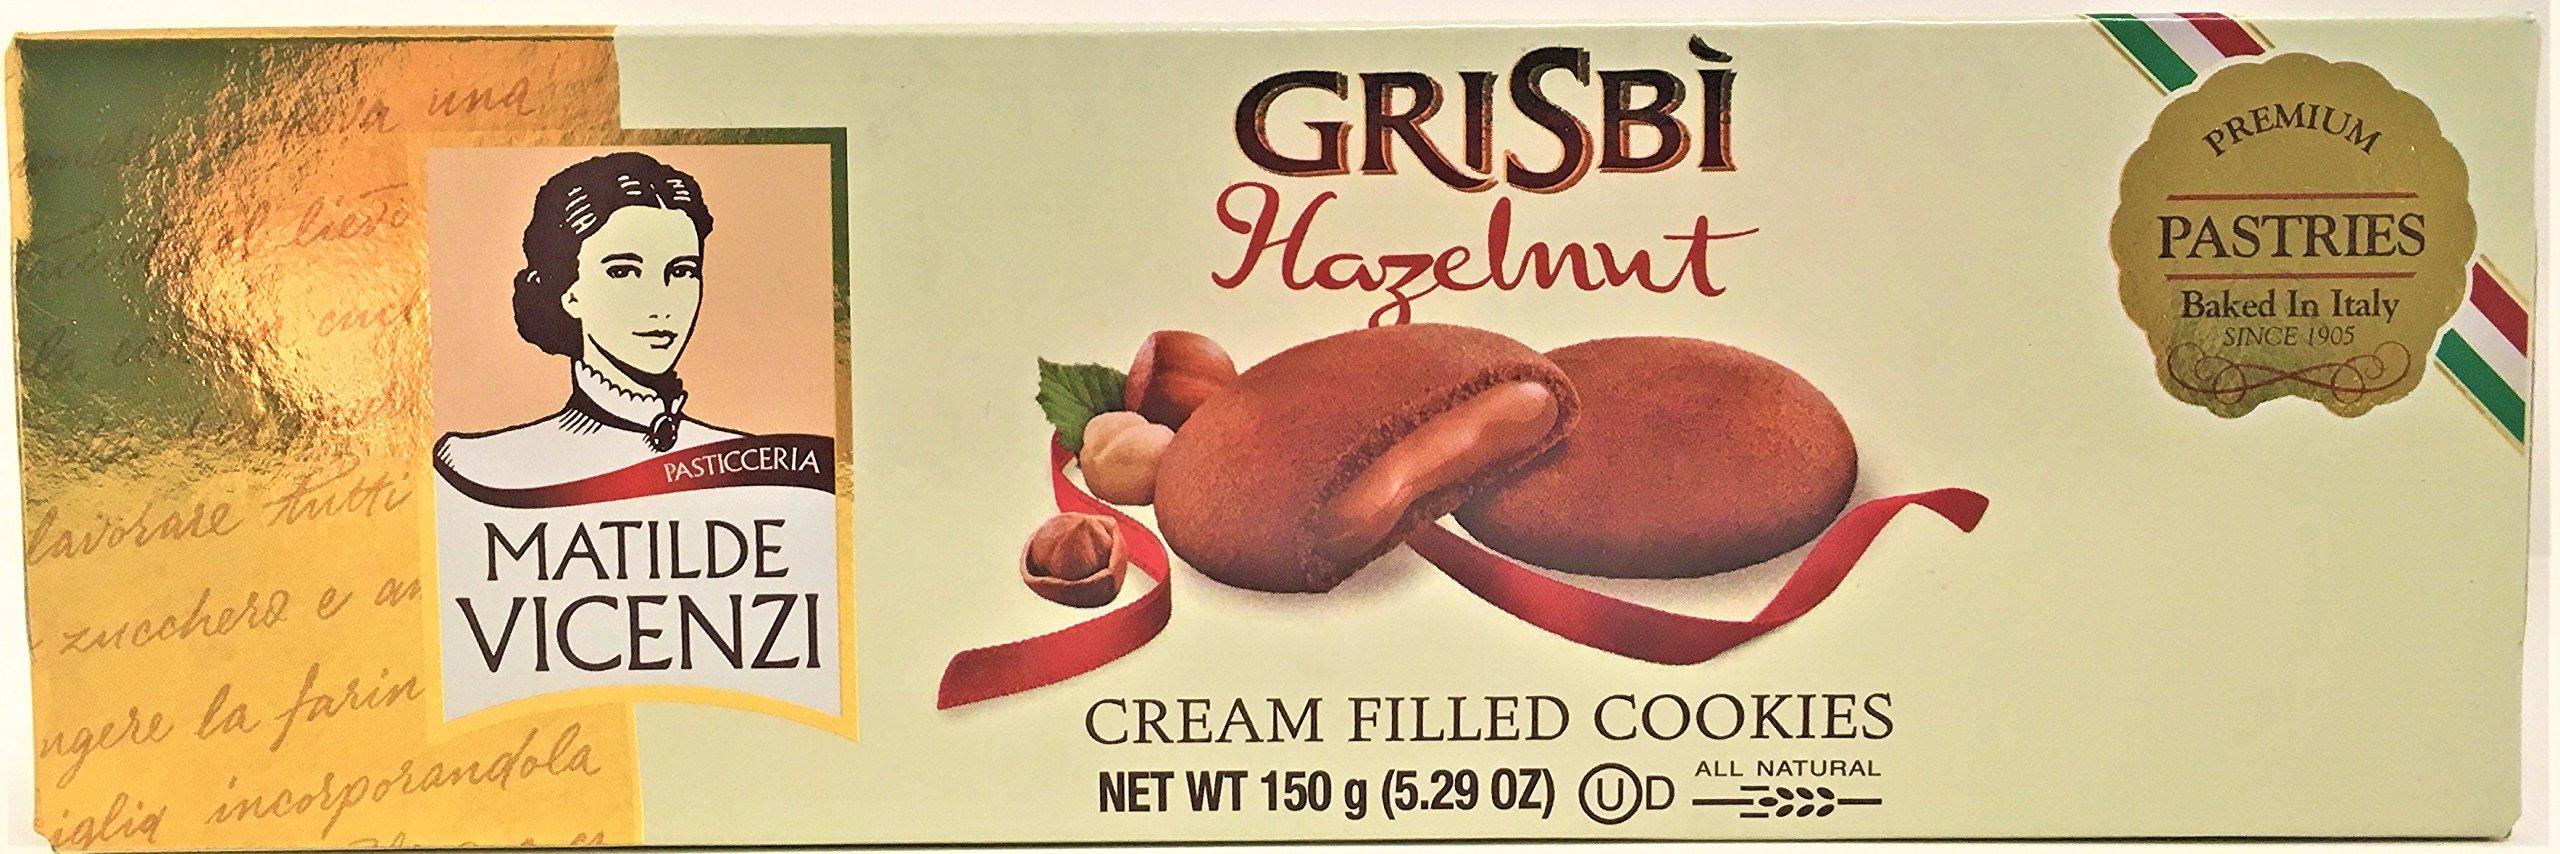 Matilde Vicenzi, Grisbi Hazelnut, Cream Filled Cookies, 5.29 oz, Pack of 6